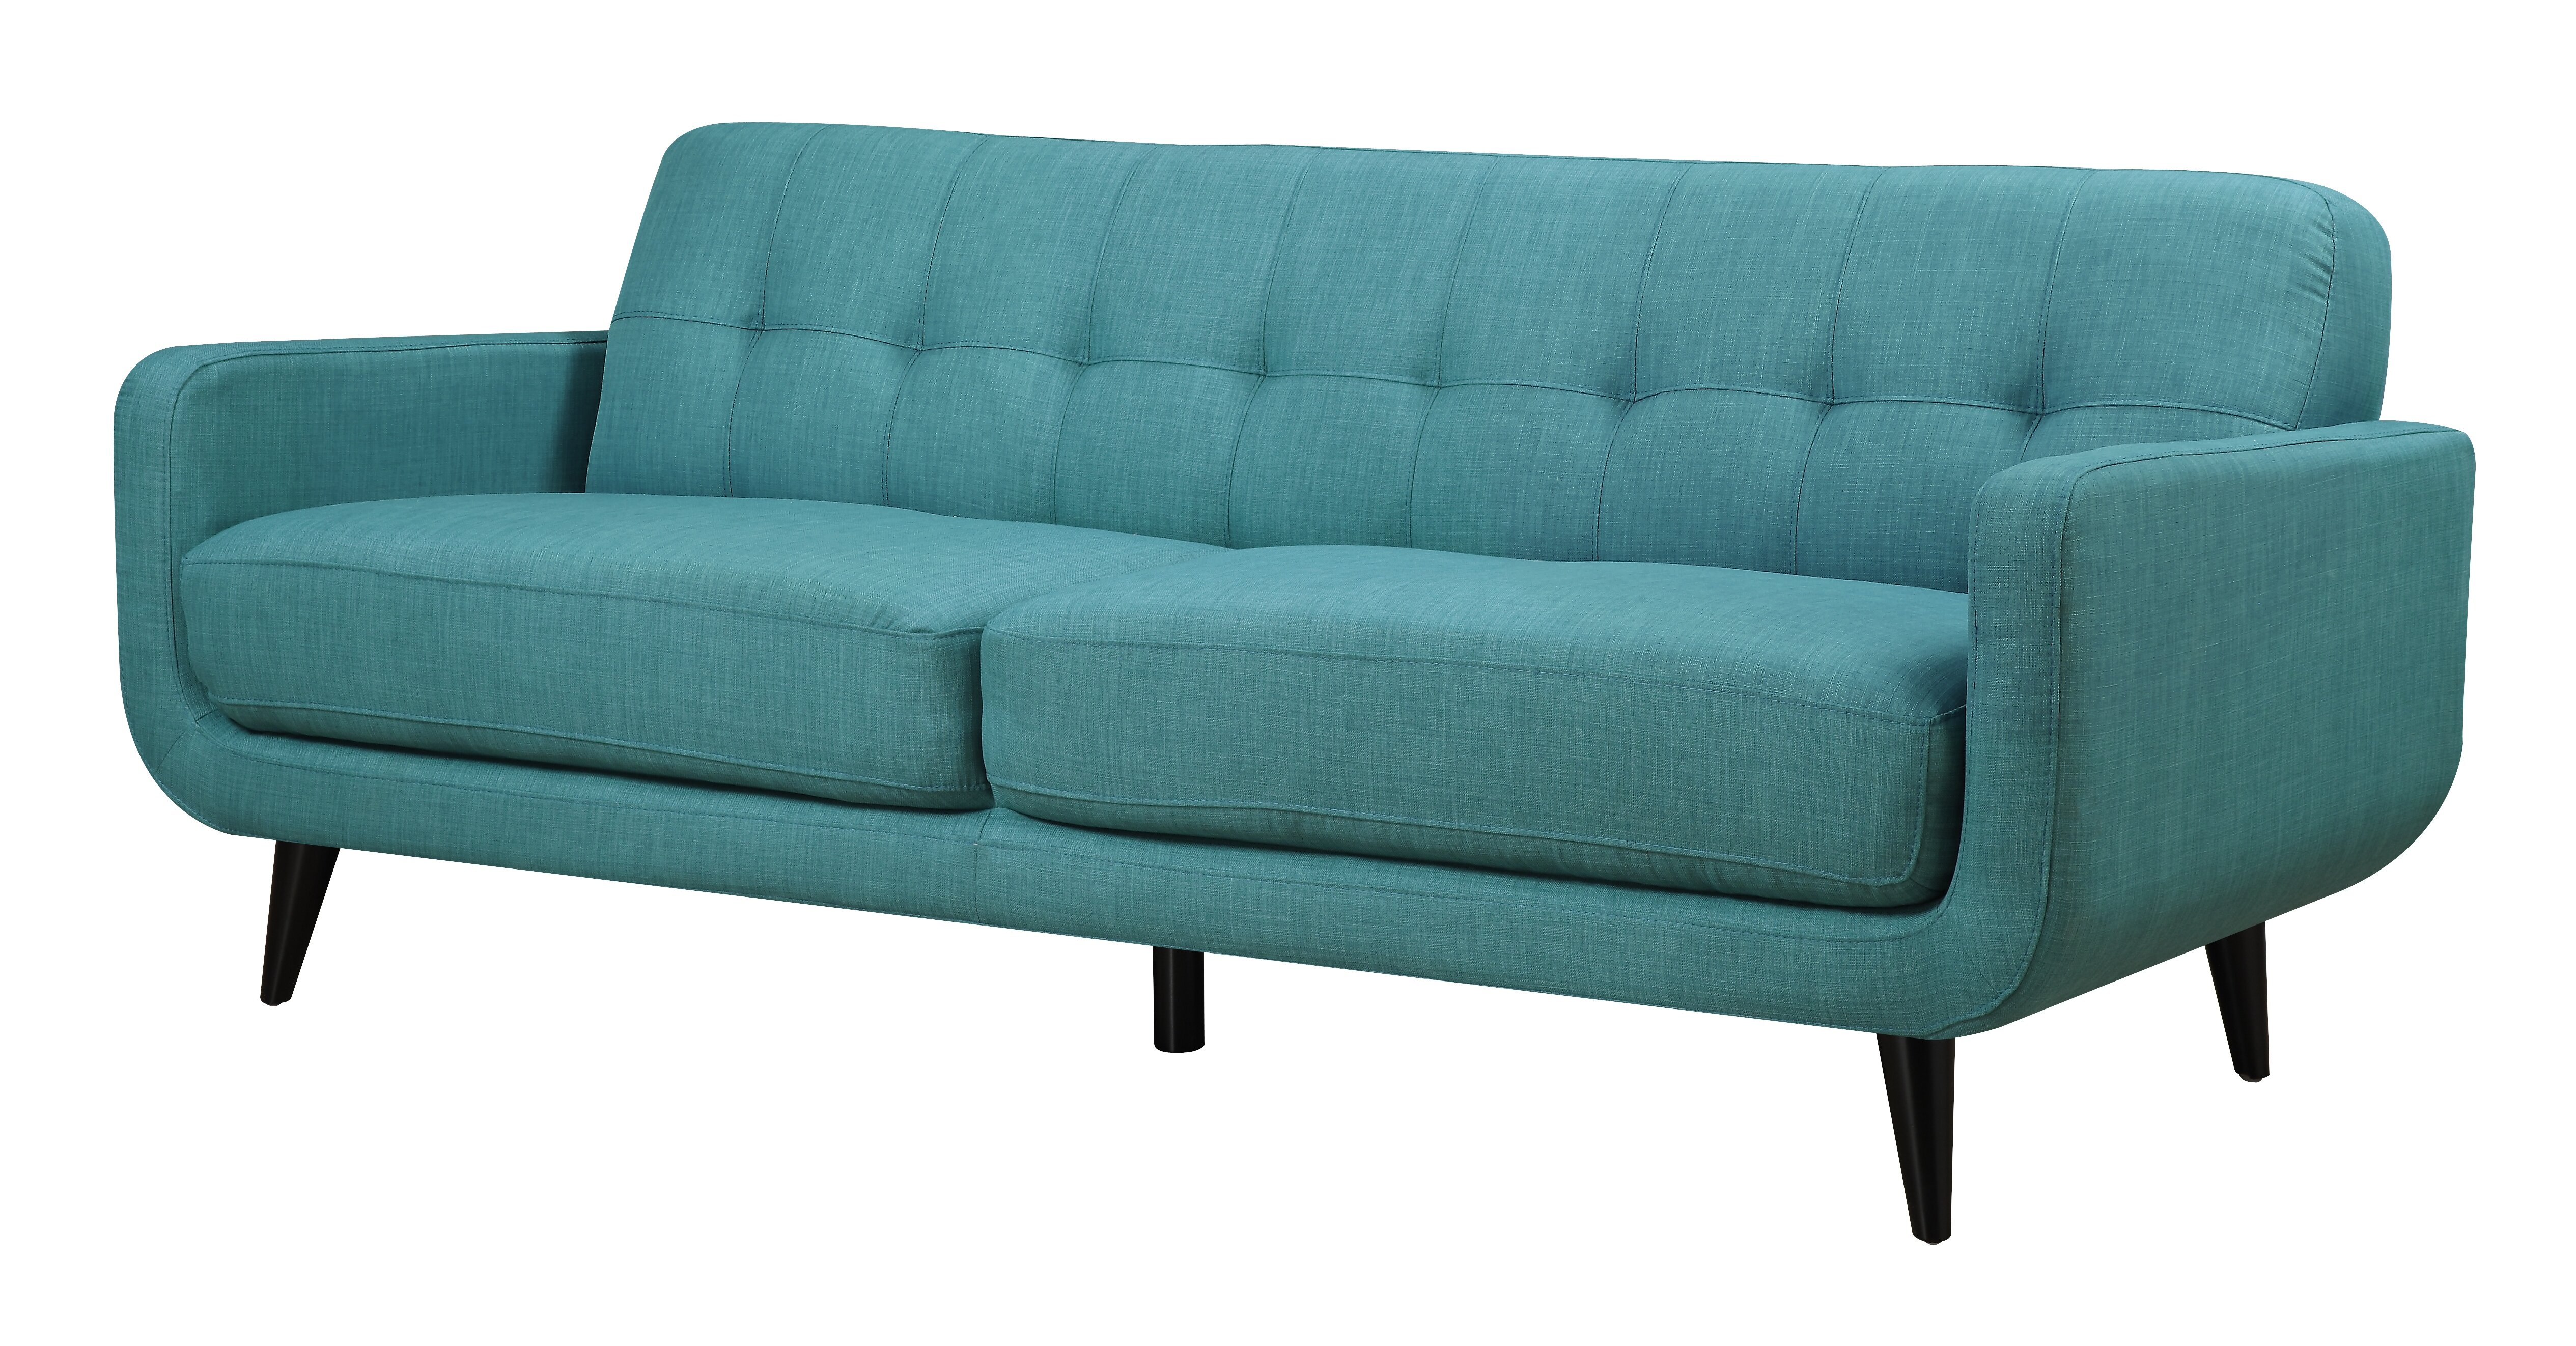 Brayden Studio Higbee Modular Sofa U0026 Reviews | Wayfair